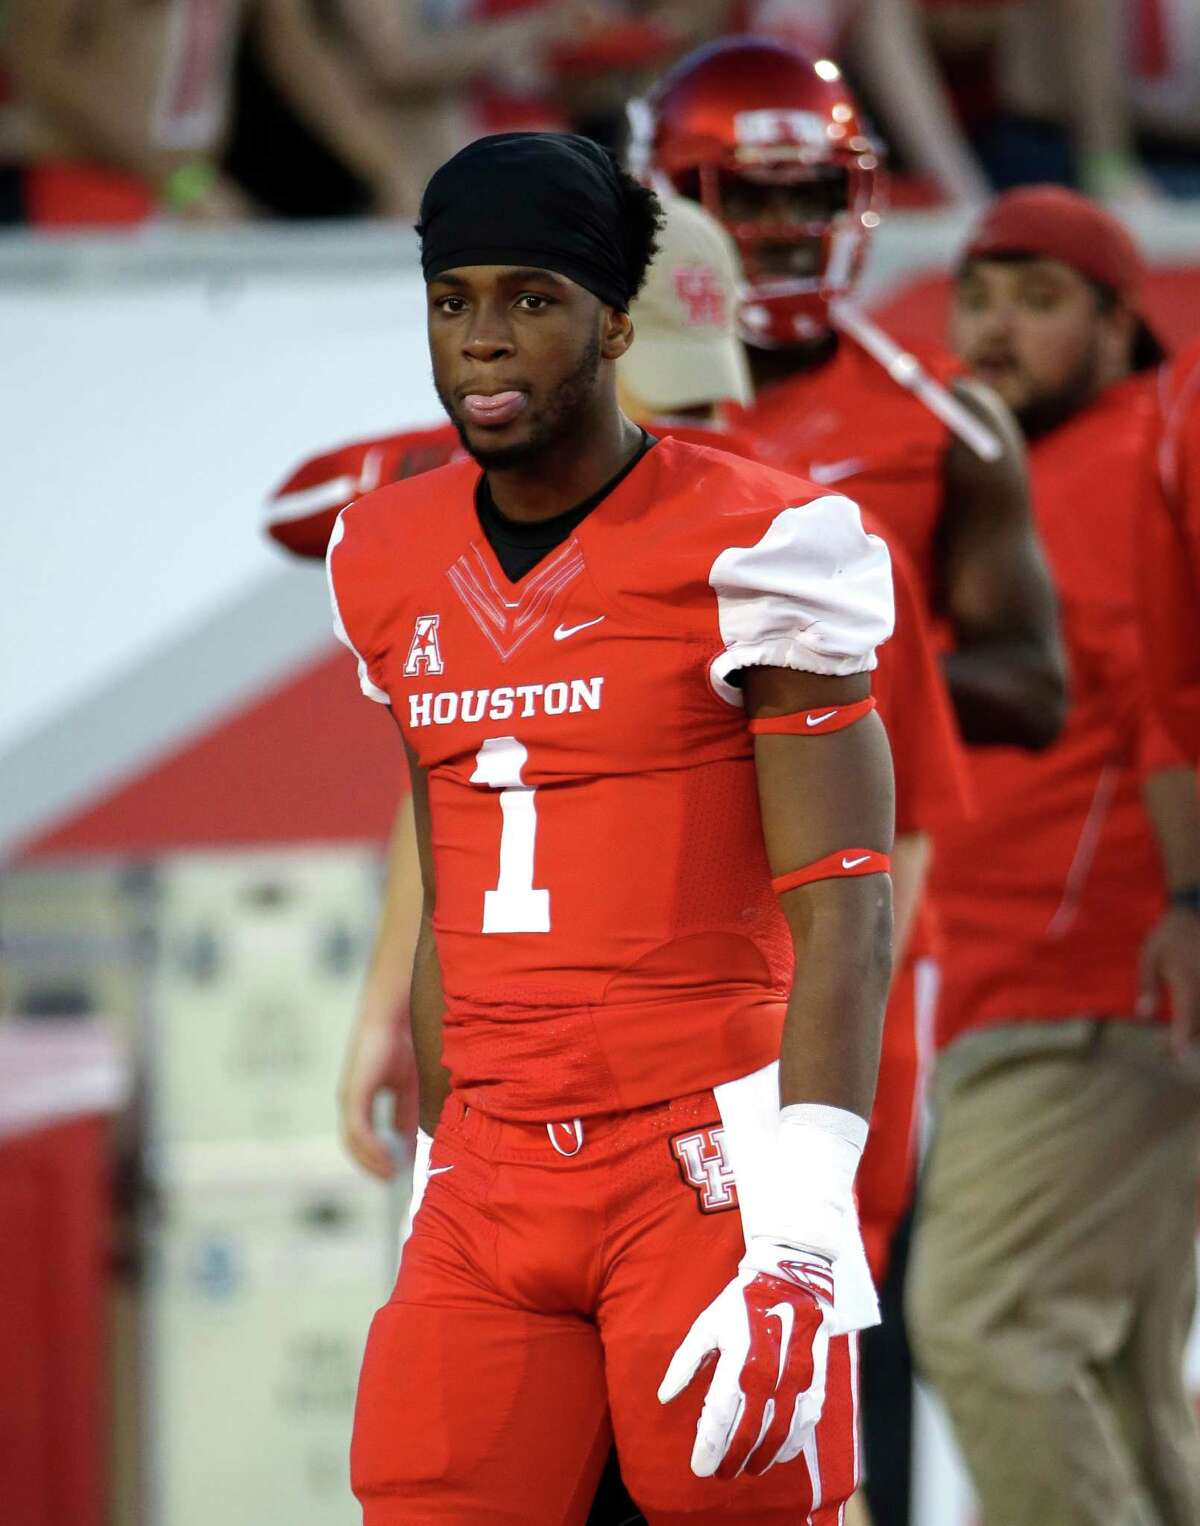 Houston quarterback Greg Ward Jr. (1) warms up before an NCAA college football game against Memphis Saturday, Nov. 14, 2015, in Houston. (AP Photo/David J. Phillip)